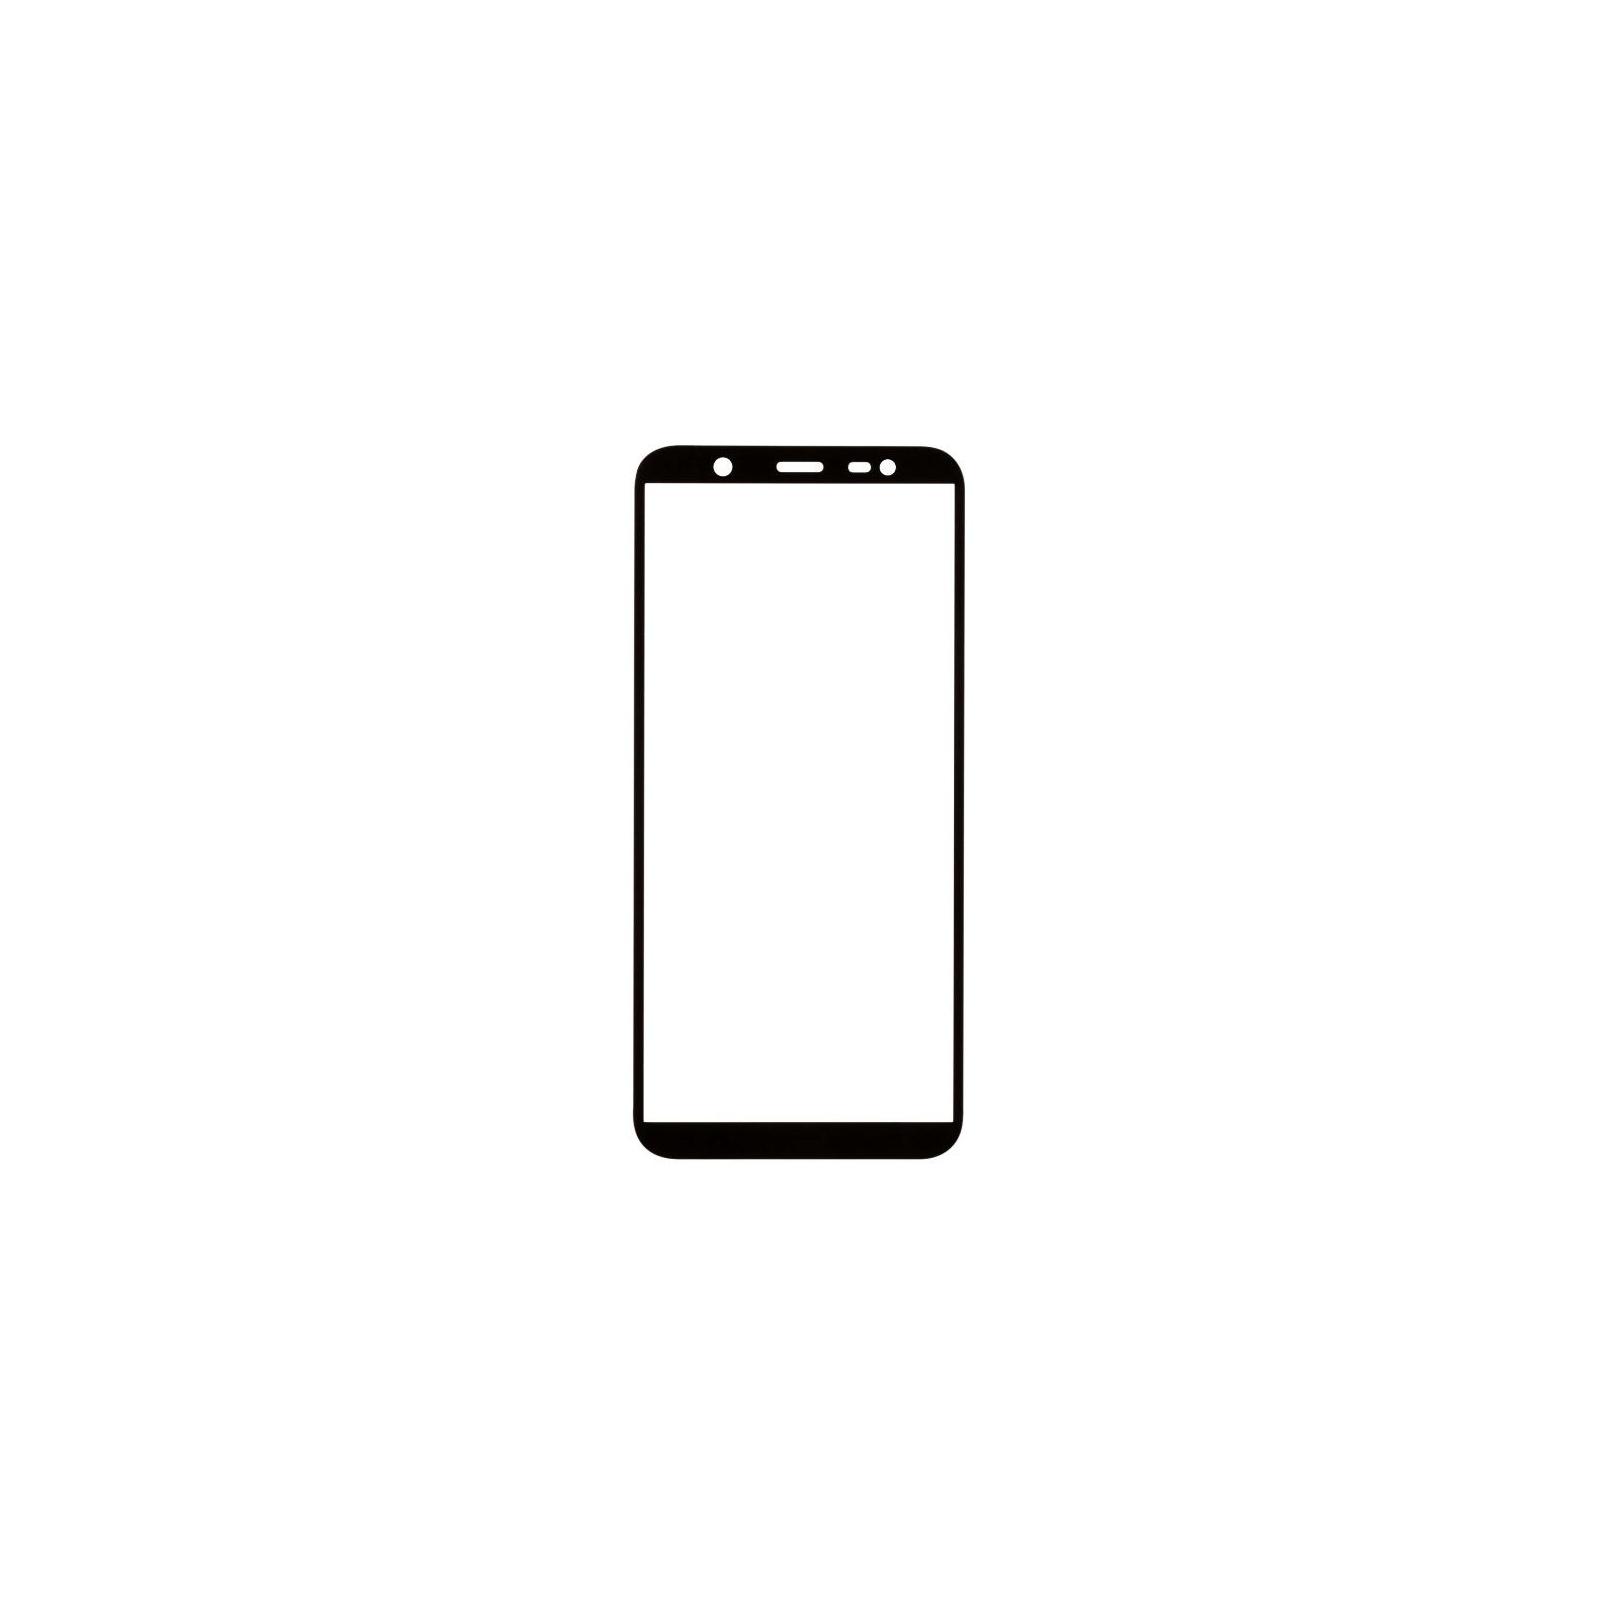 Стекло защитное MakeFuture для Samsung J8 2018 Black Full Cover (MGFC-SJ818B) изображение 3